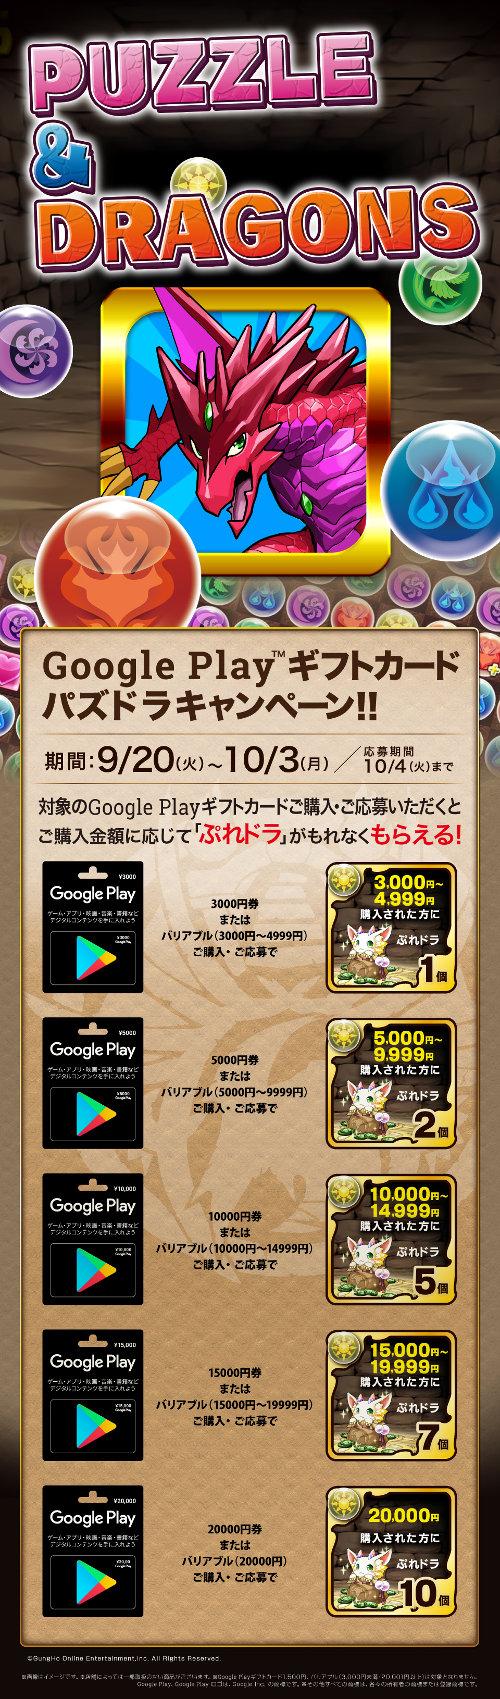 GooglePlayギフトカード購入でぷれドラゲット